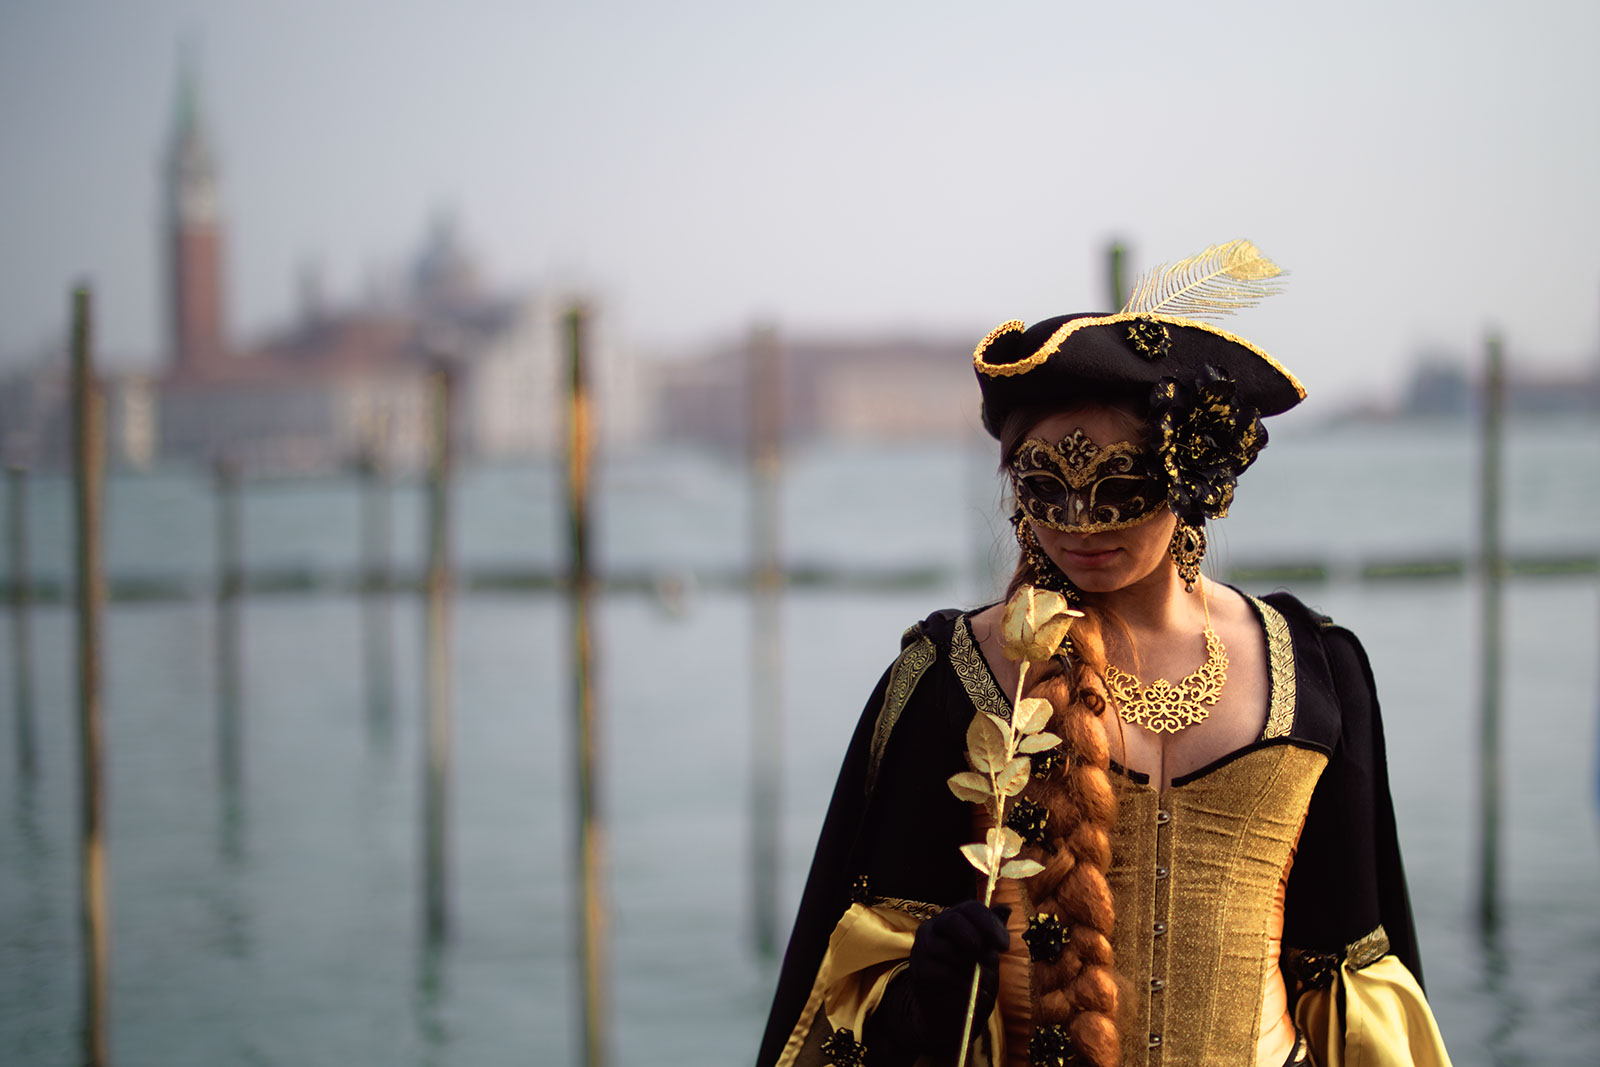 Valentijn in Venetië, februari 2015